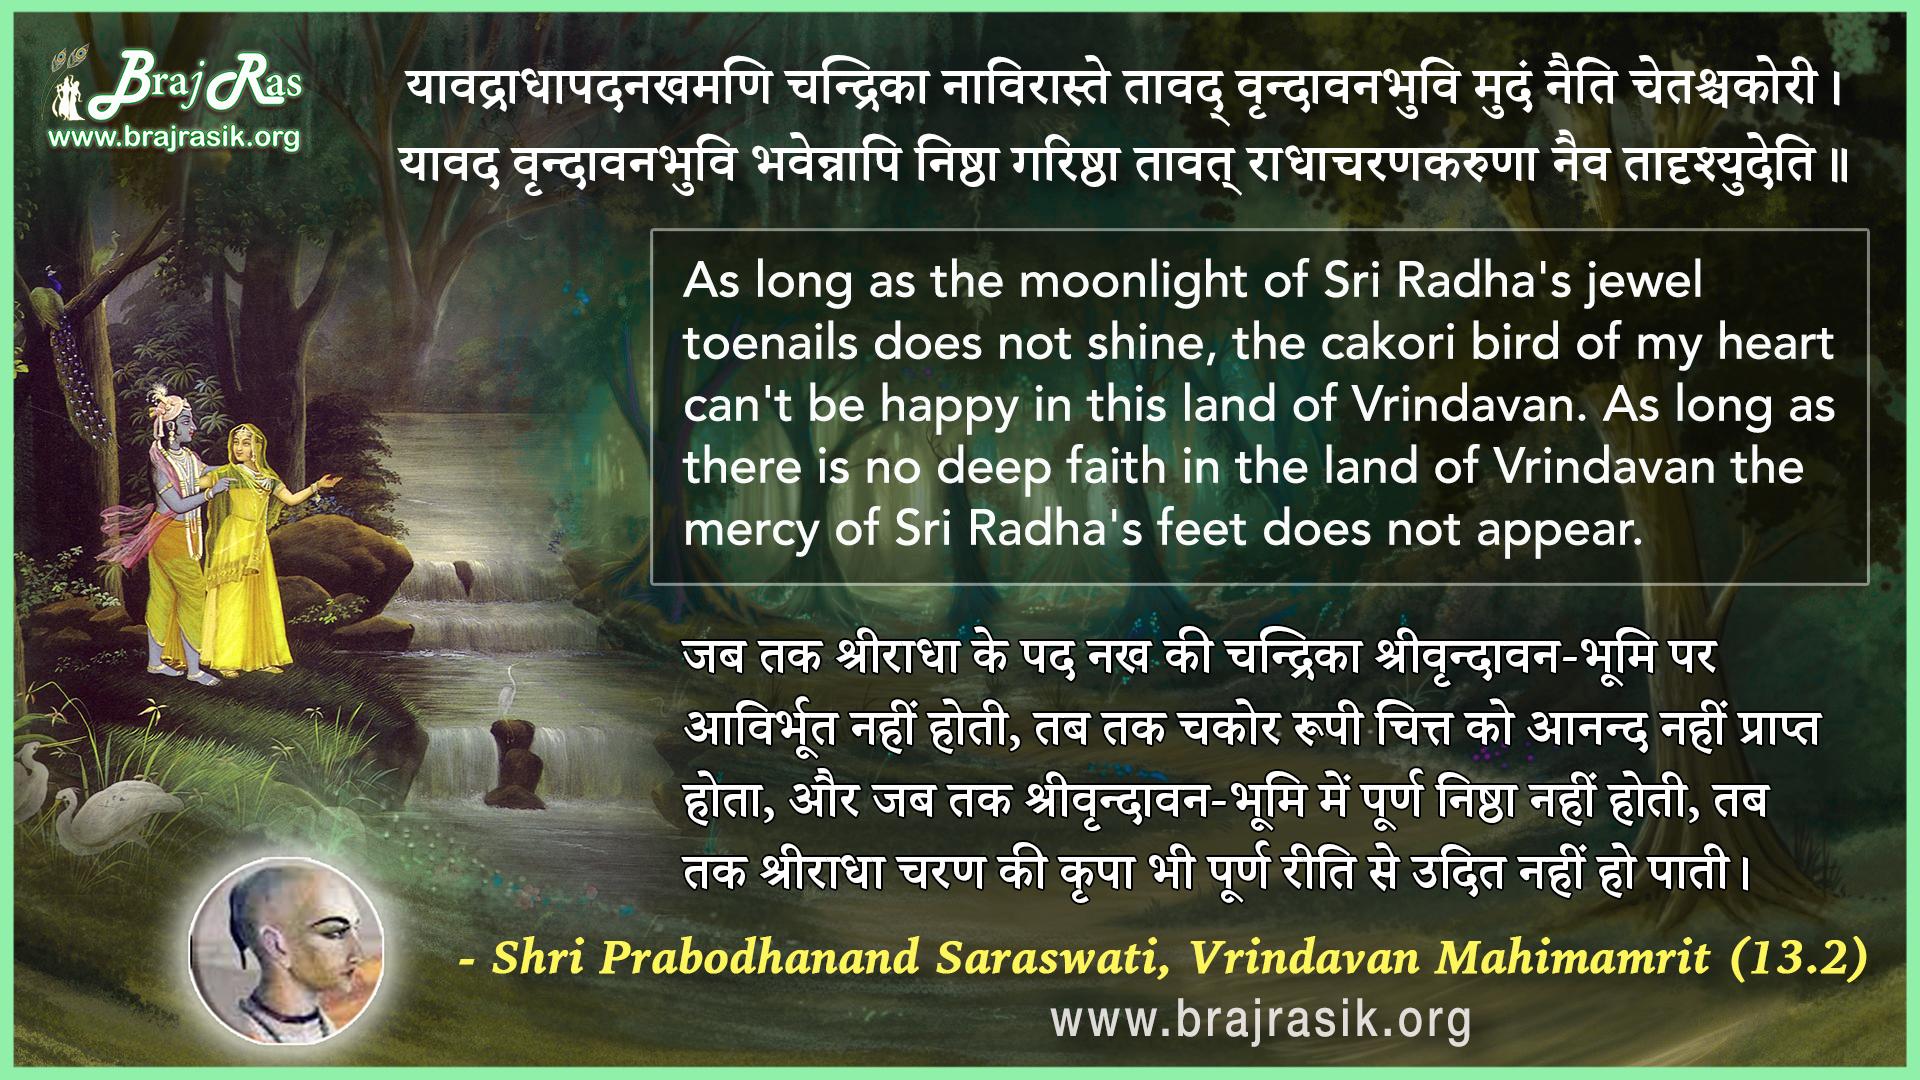 Yaavadradhapadanakhamani Chandrika Naaviraaste - Shri Prabodhanand Saraswati, Vrindavan Mahimamrit (13.2)